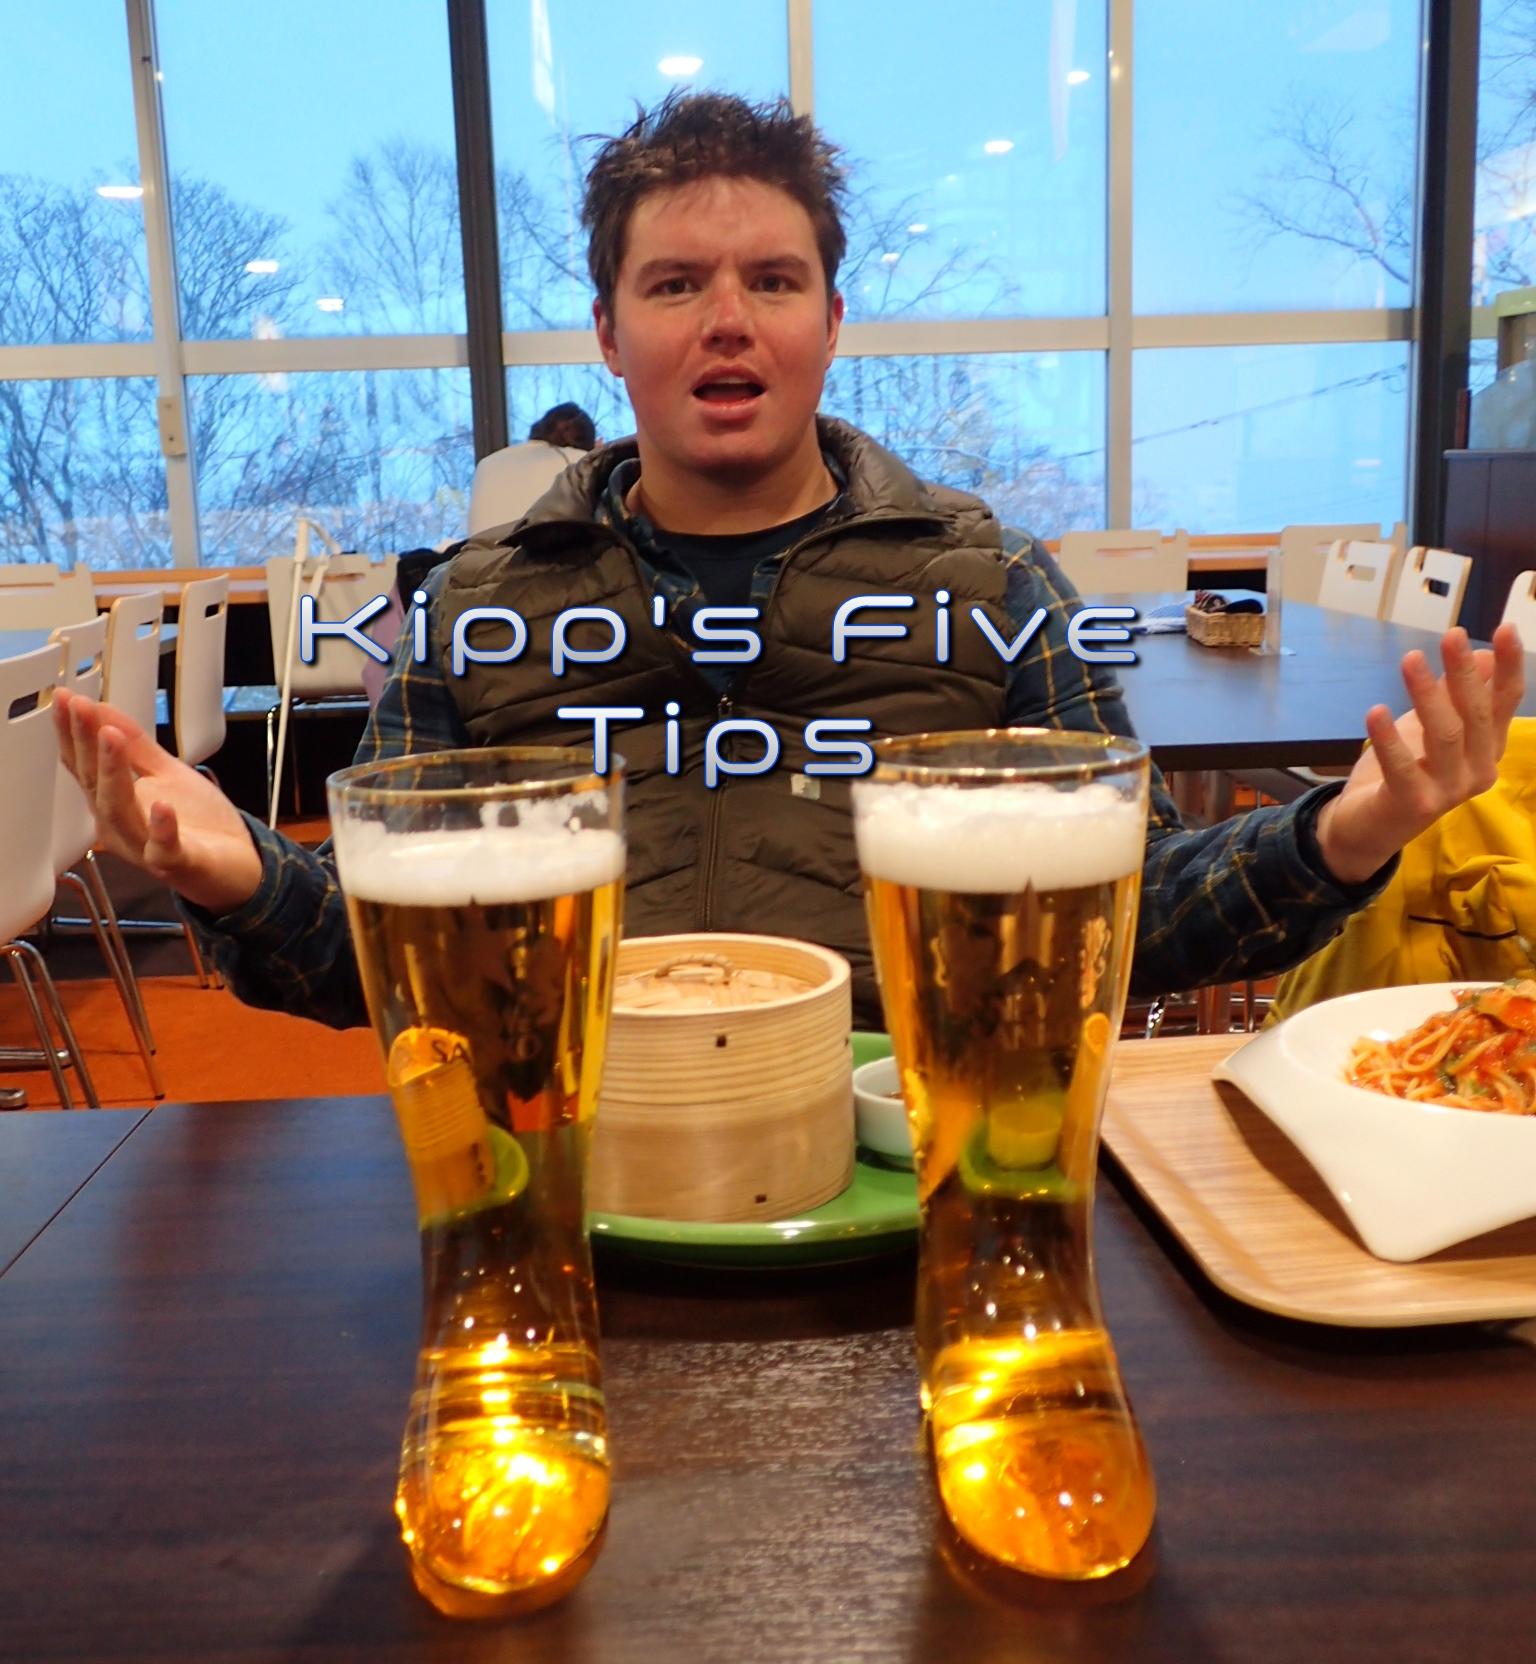 Kipp's Five Tips pic_904654523.jpg